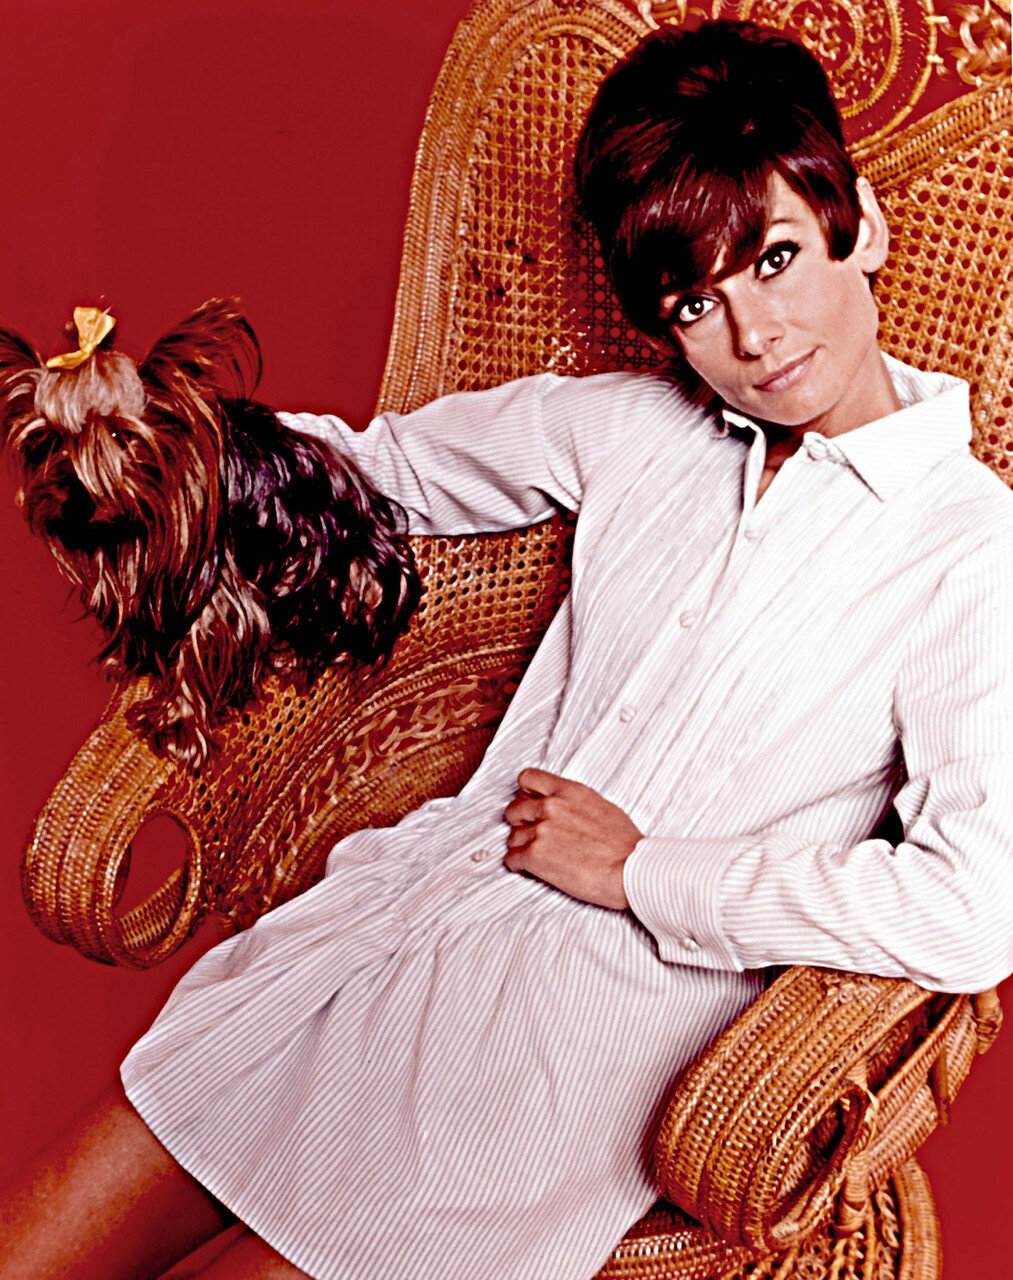 Audrey Hepburn, Two for the road (1967) starring Albert Finney